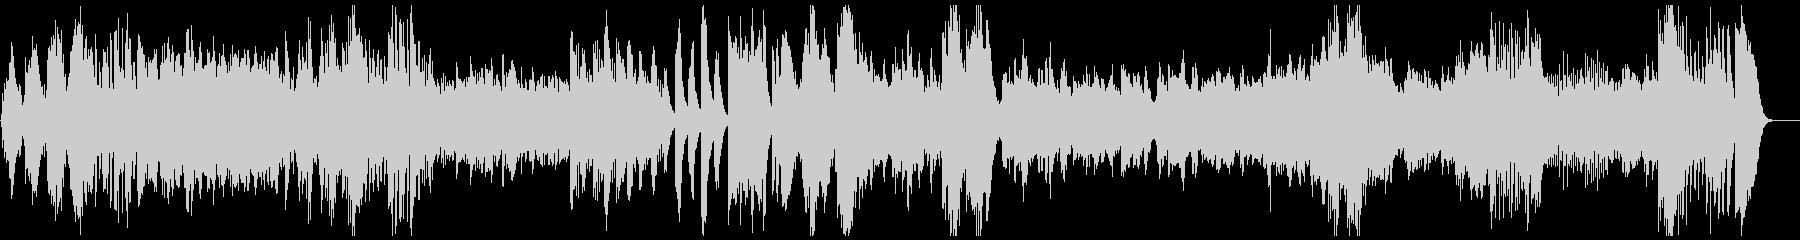 RV522_3『アレグロ』ビバルディの未再生の波形